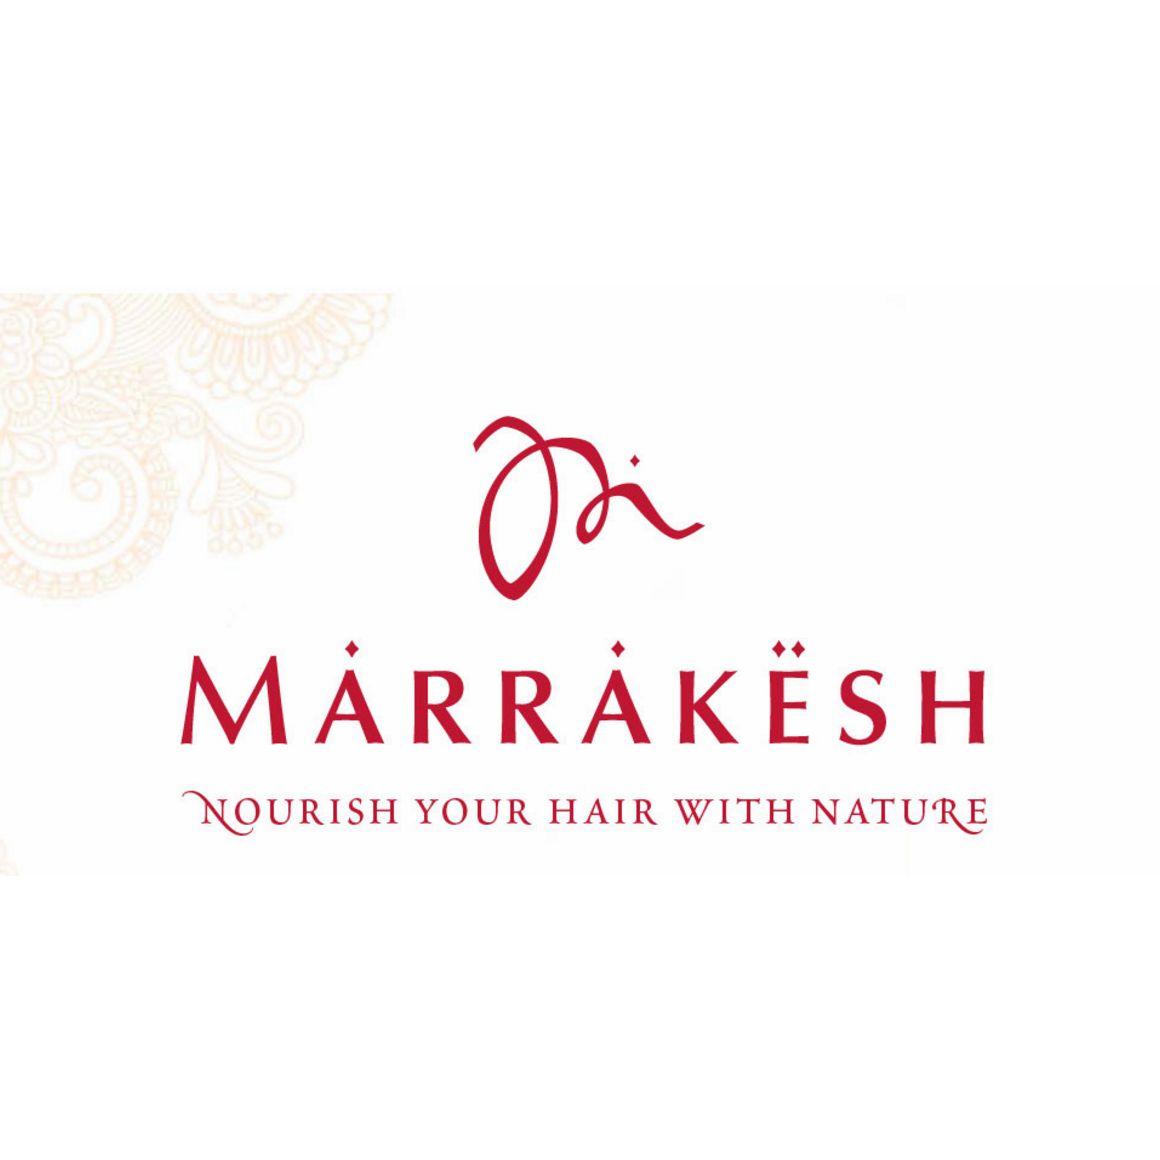 MARRAKESH HAIR CARE: Productos  de Mathiss